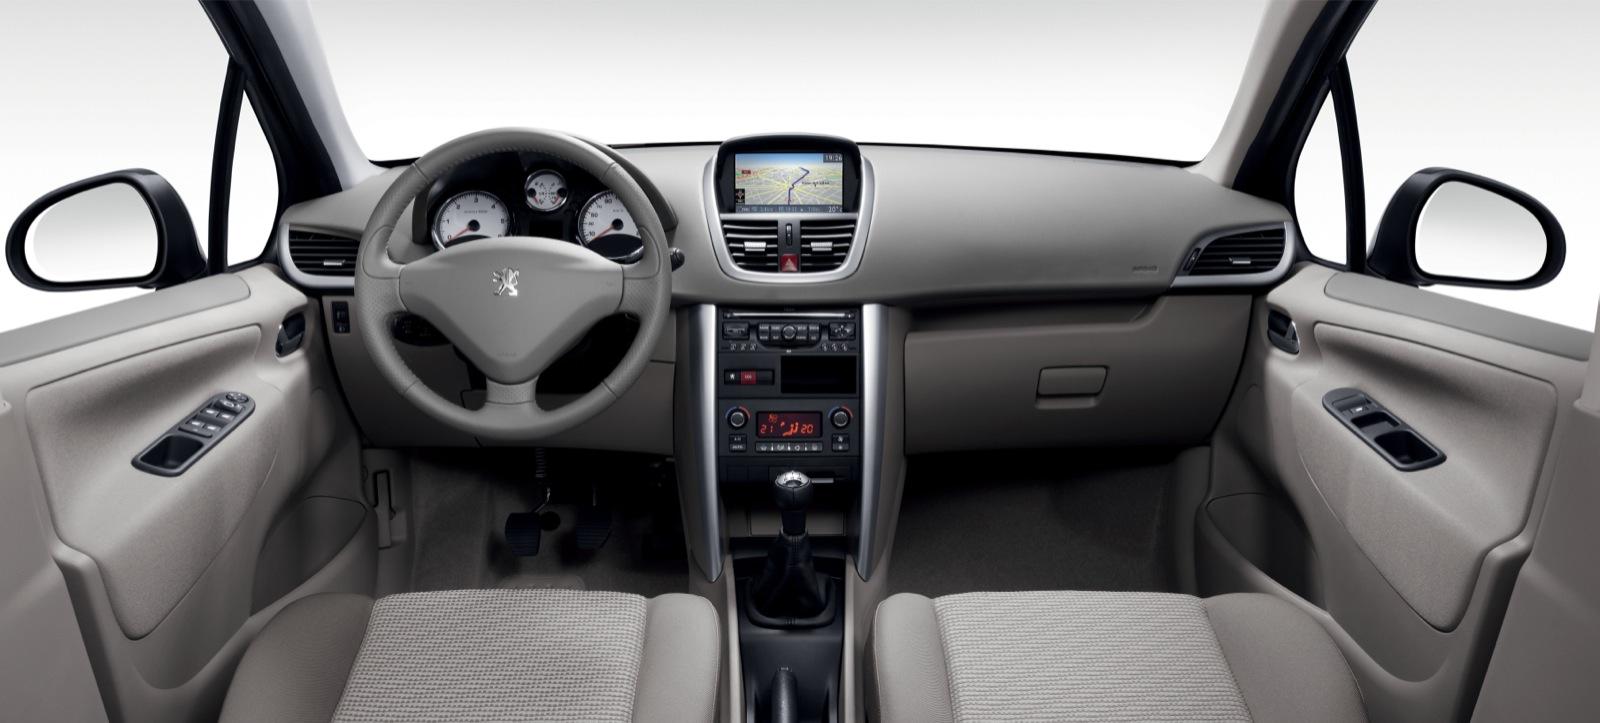 Led Lights For Cars >> PEUGEOT 207 - 5 doors specs - 2009, 2010, 2011, 2012 ...